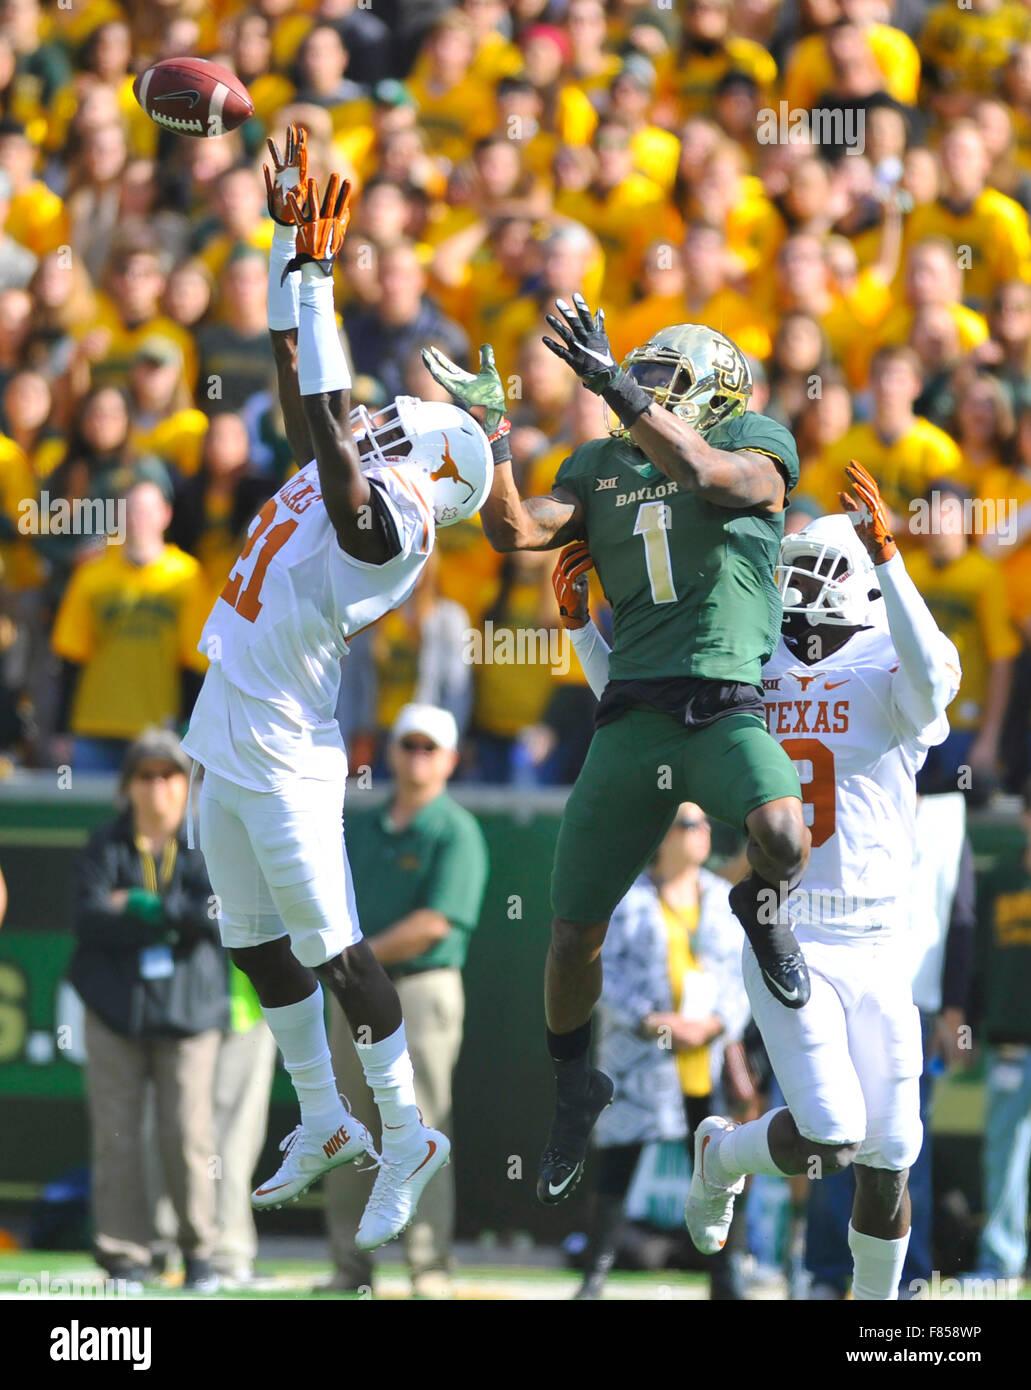 Waco, Texas, USA. 05th Dec, 2015. Texas cornerback Duke Thomas (21) intercepts a pass intended for Baylor receiver Stock Photo